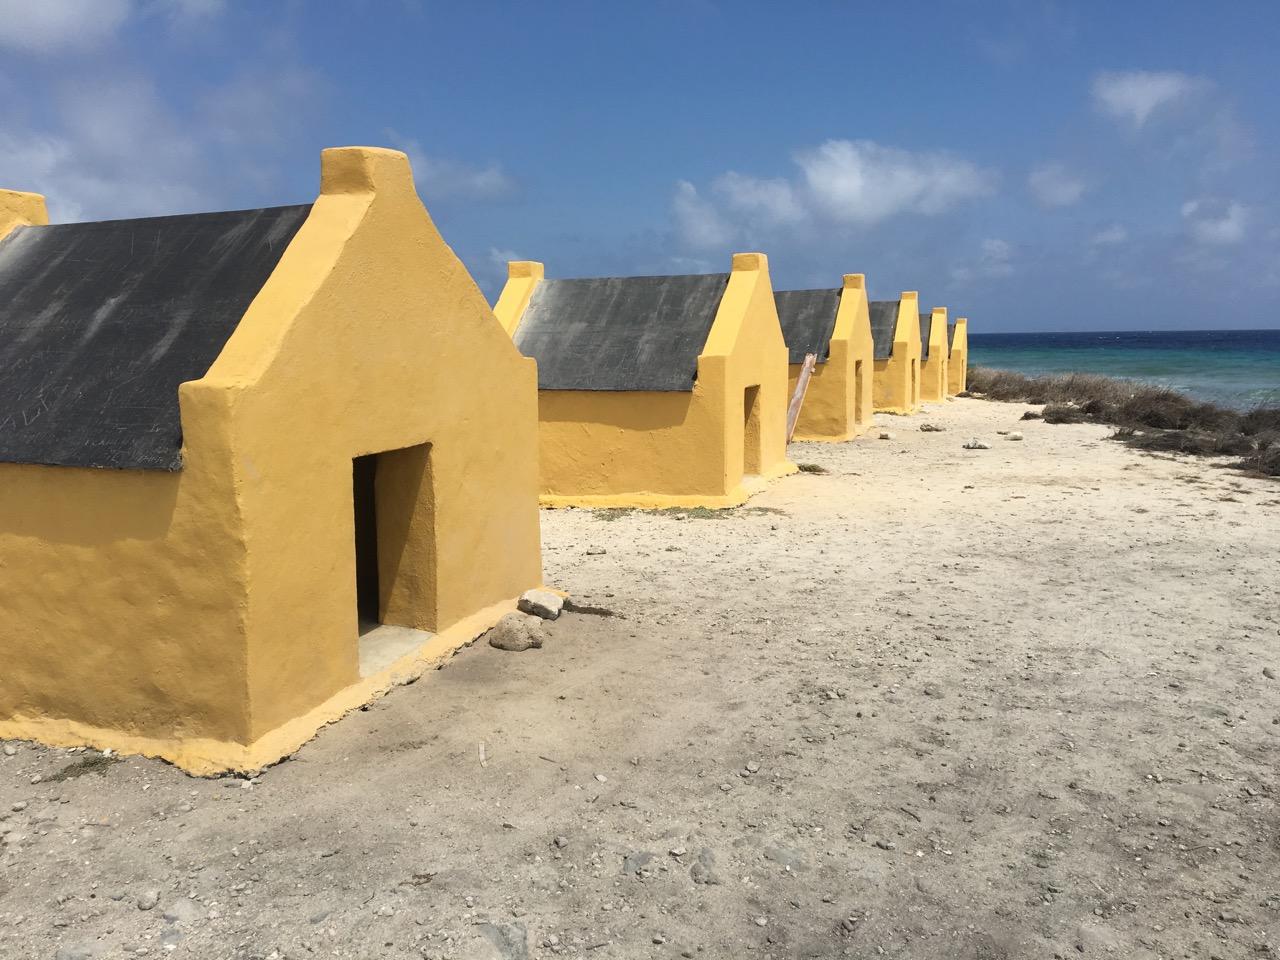 Slave Huts - Explore Bonaire's History